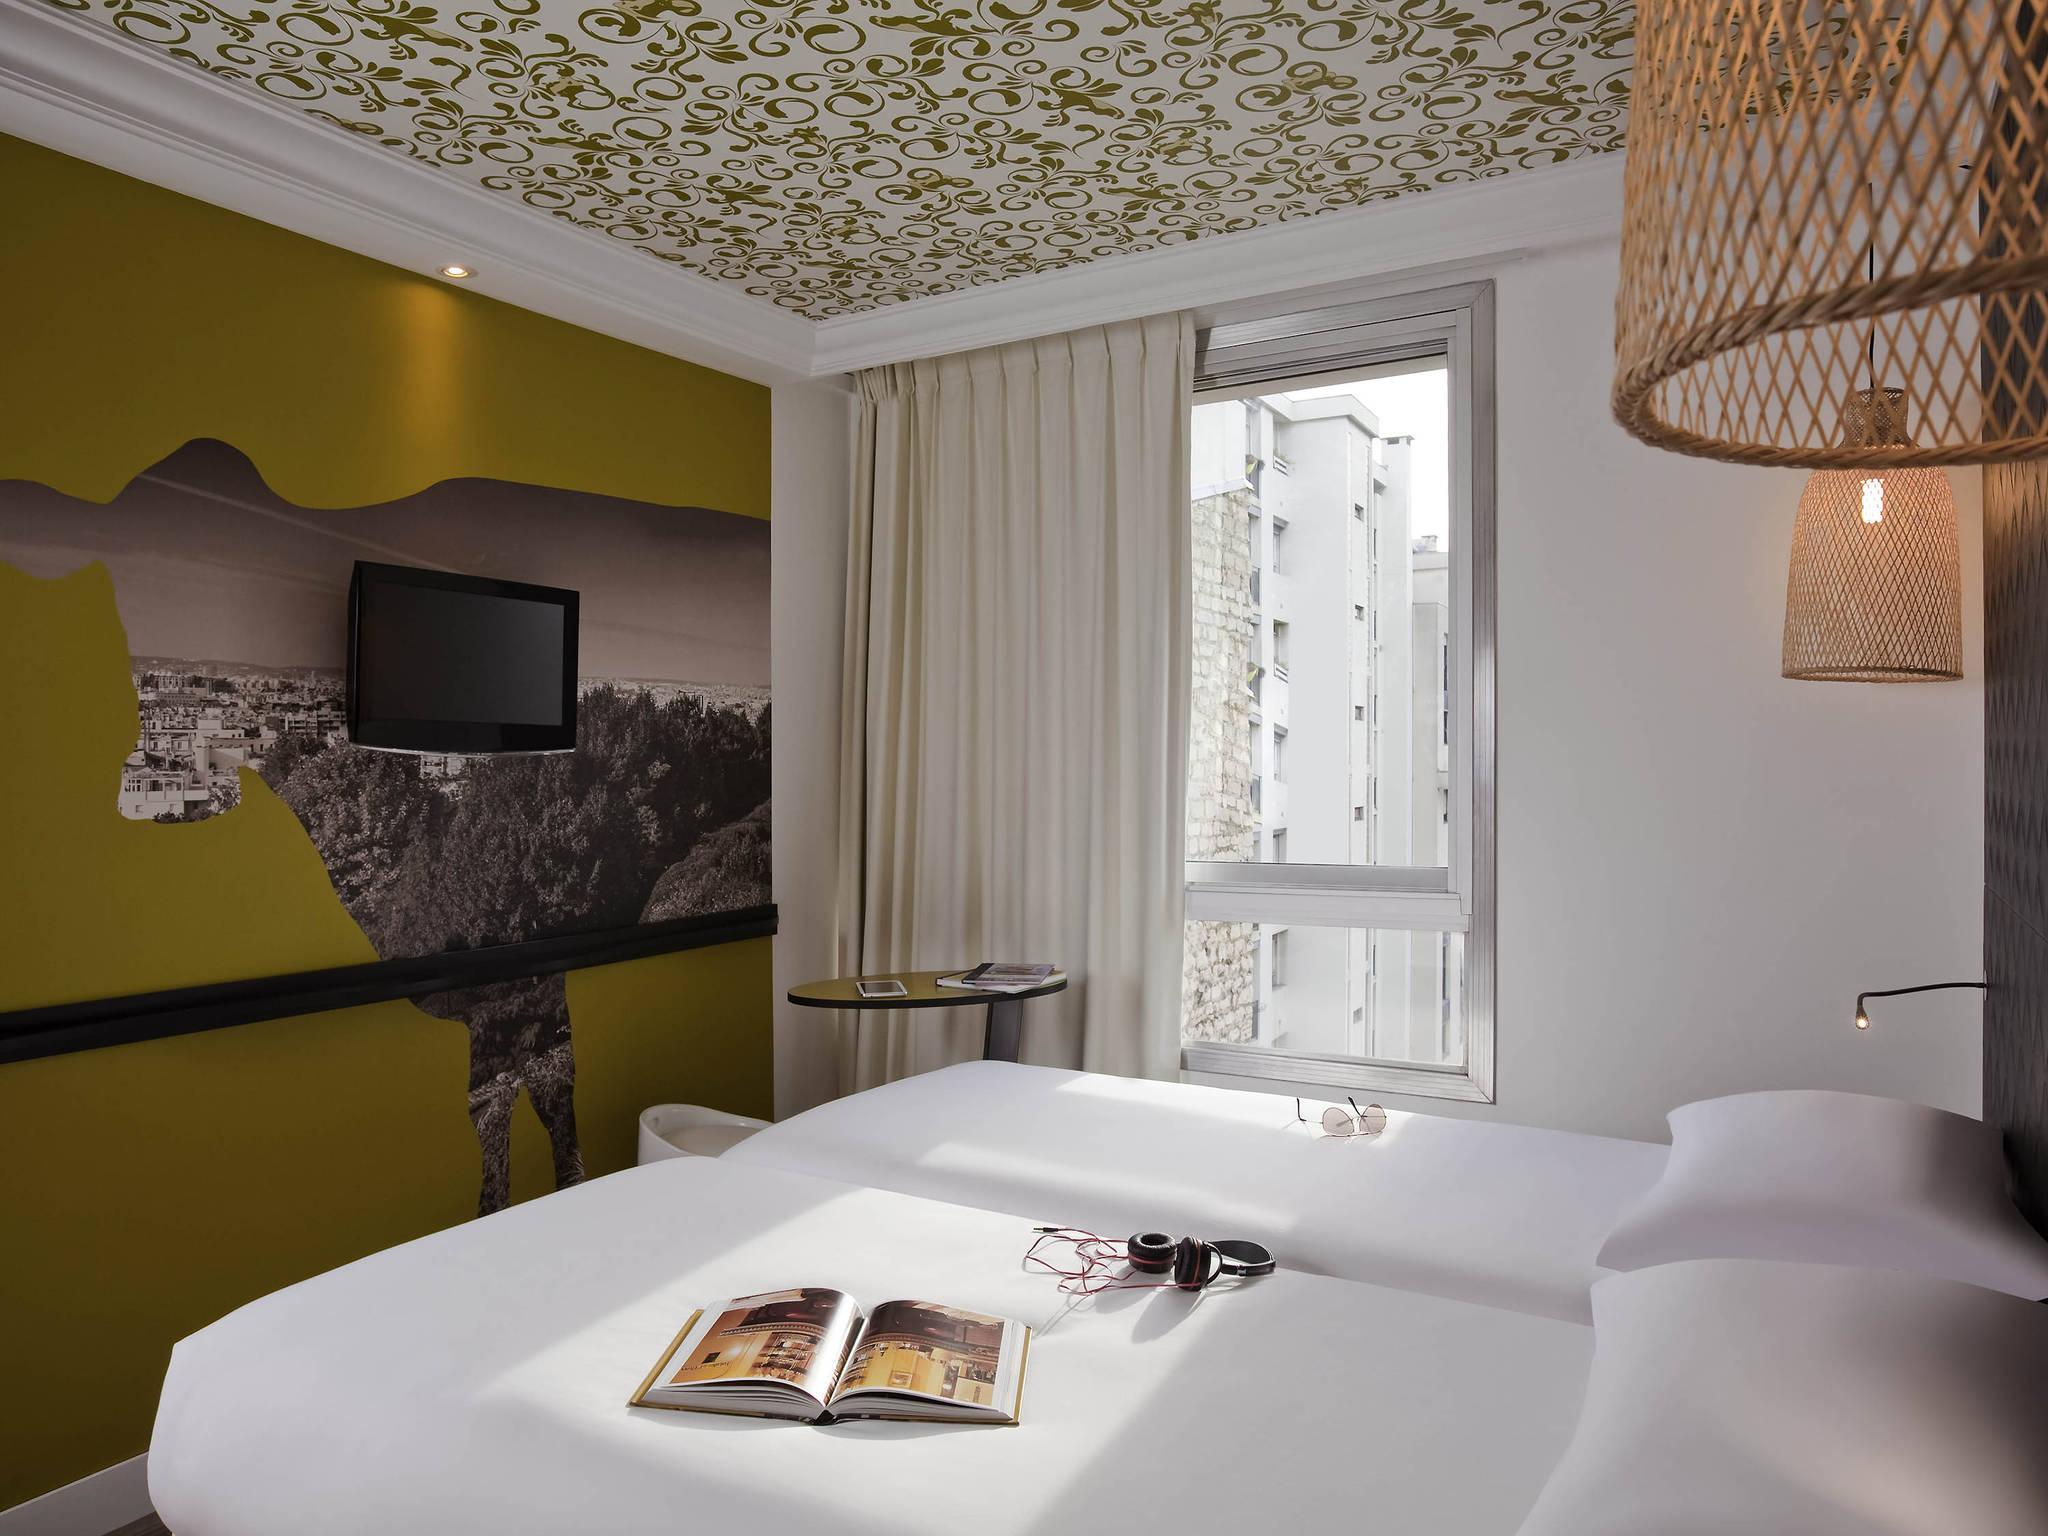 فندق - ibis Styles باريس بوت شومون